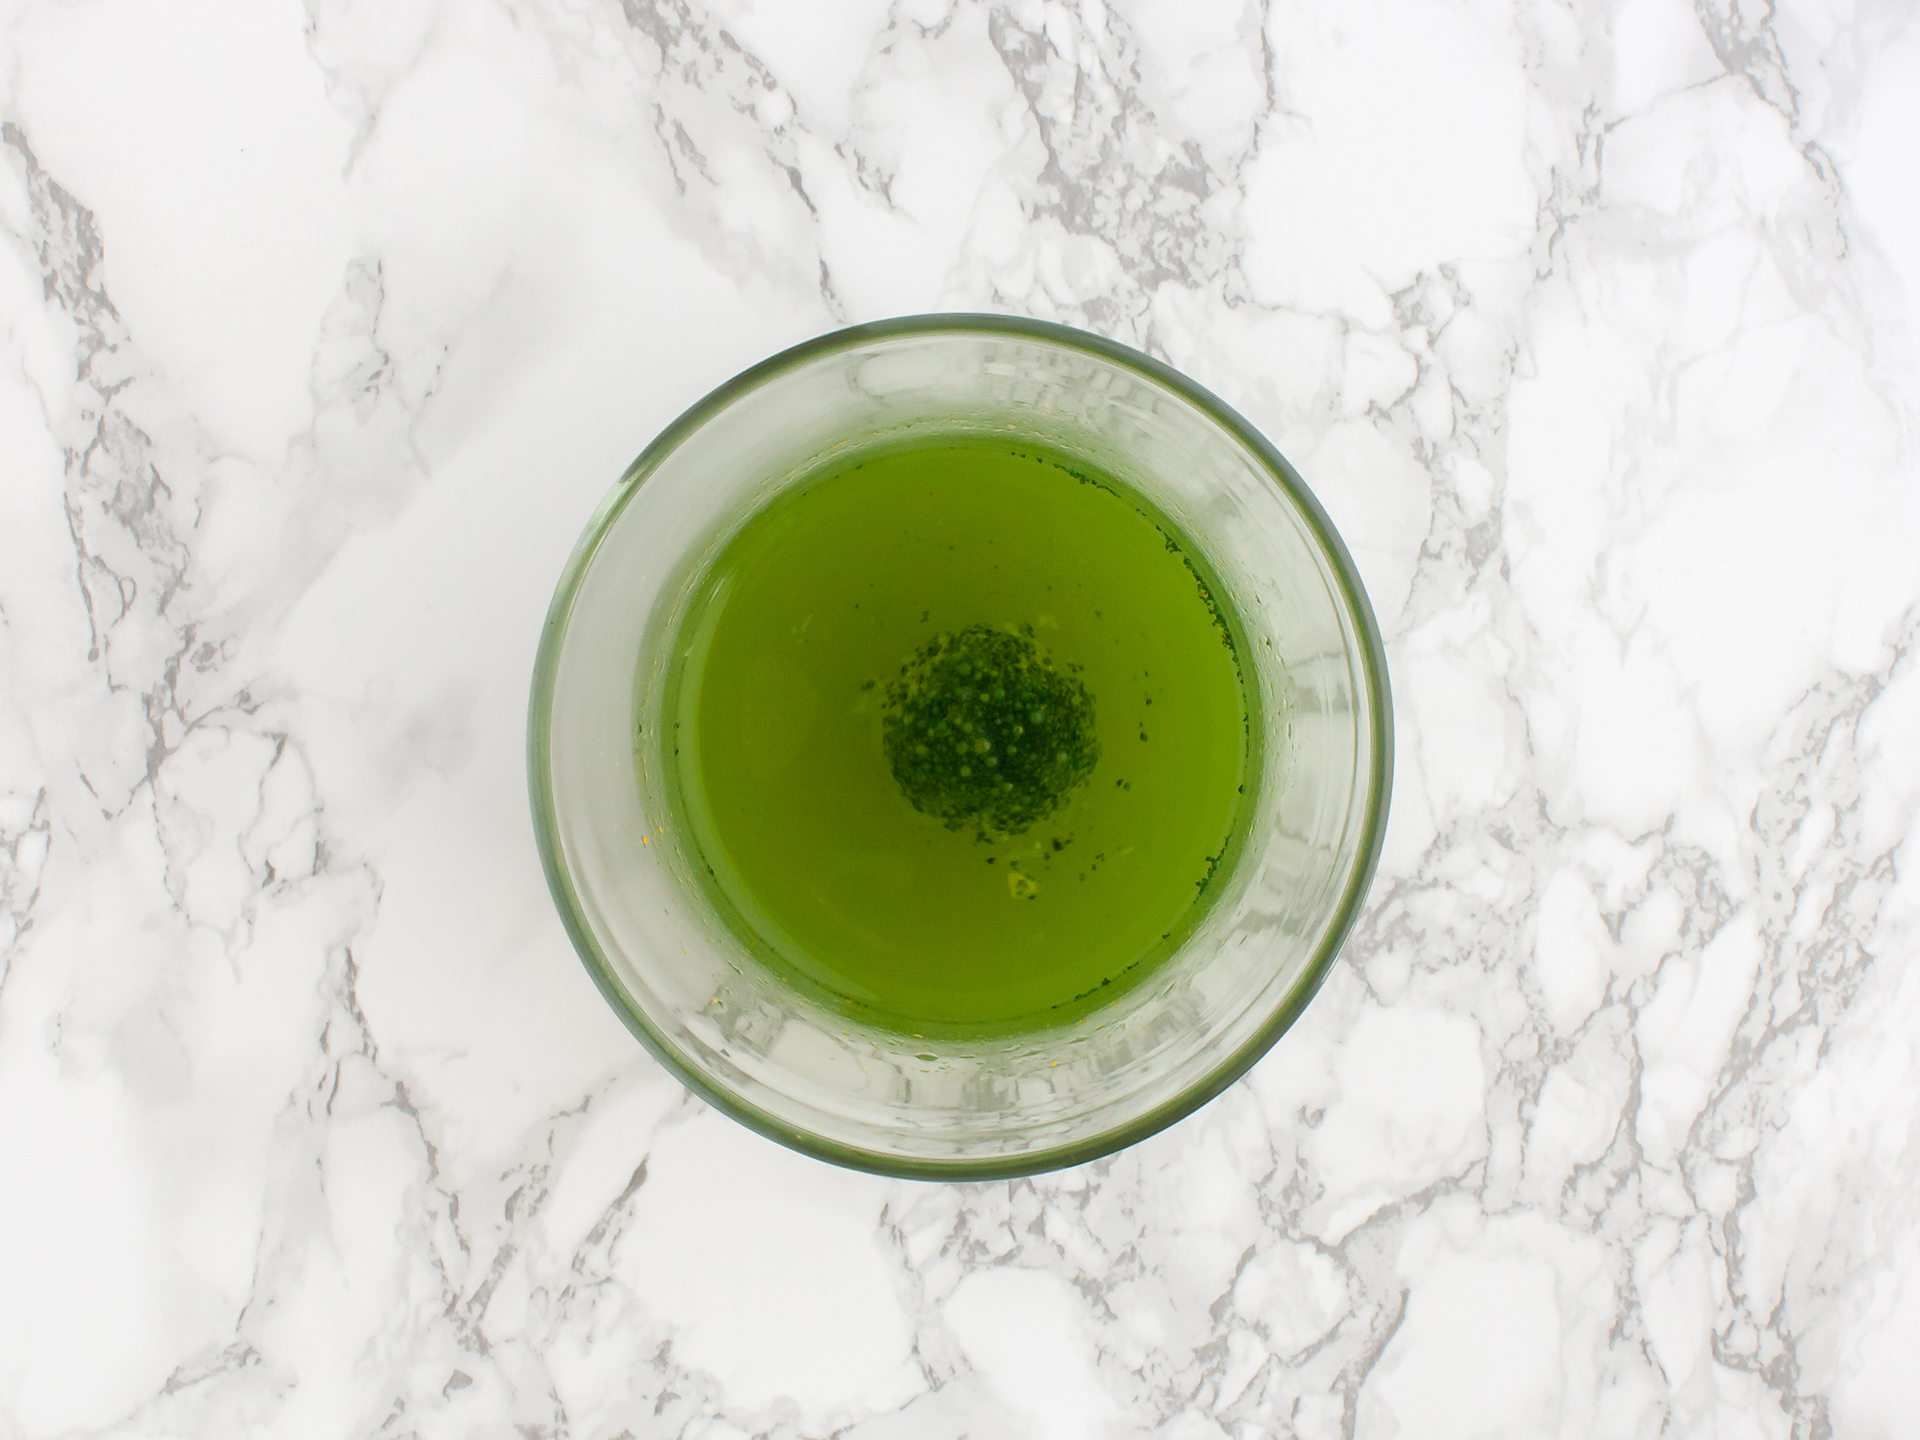 Step 3.2 of Detox Grapefruit Spirulina Lemonade with Turmeric